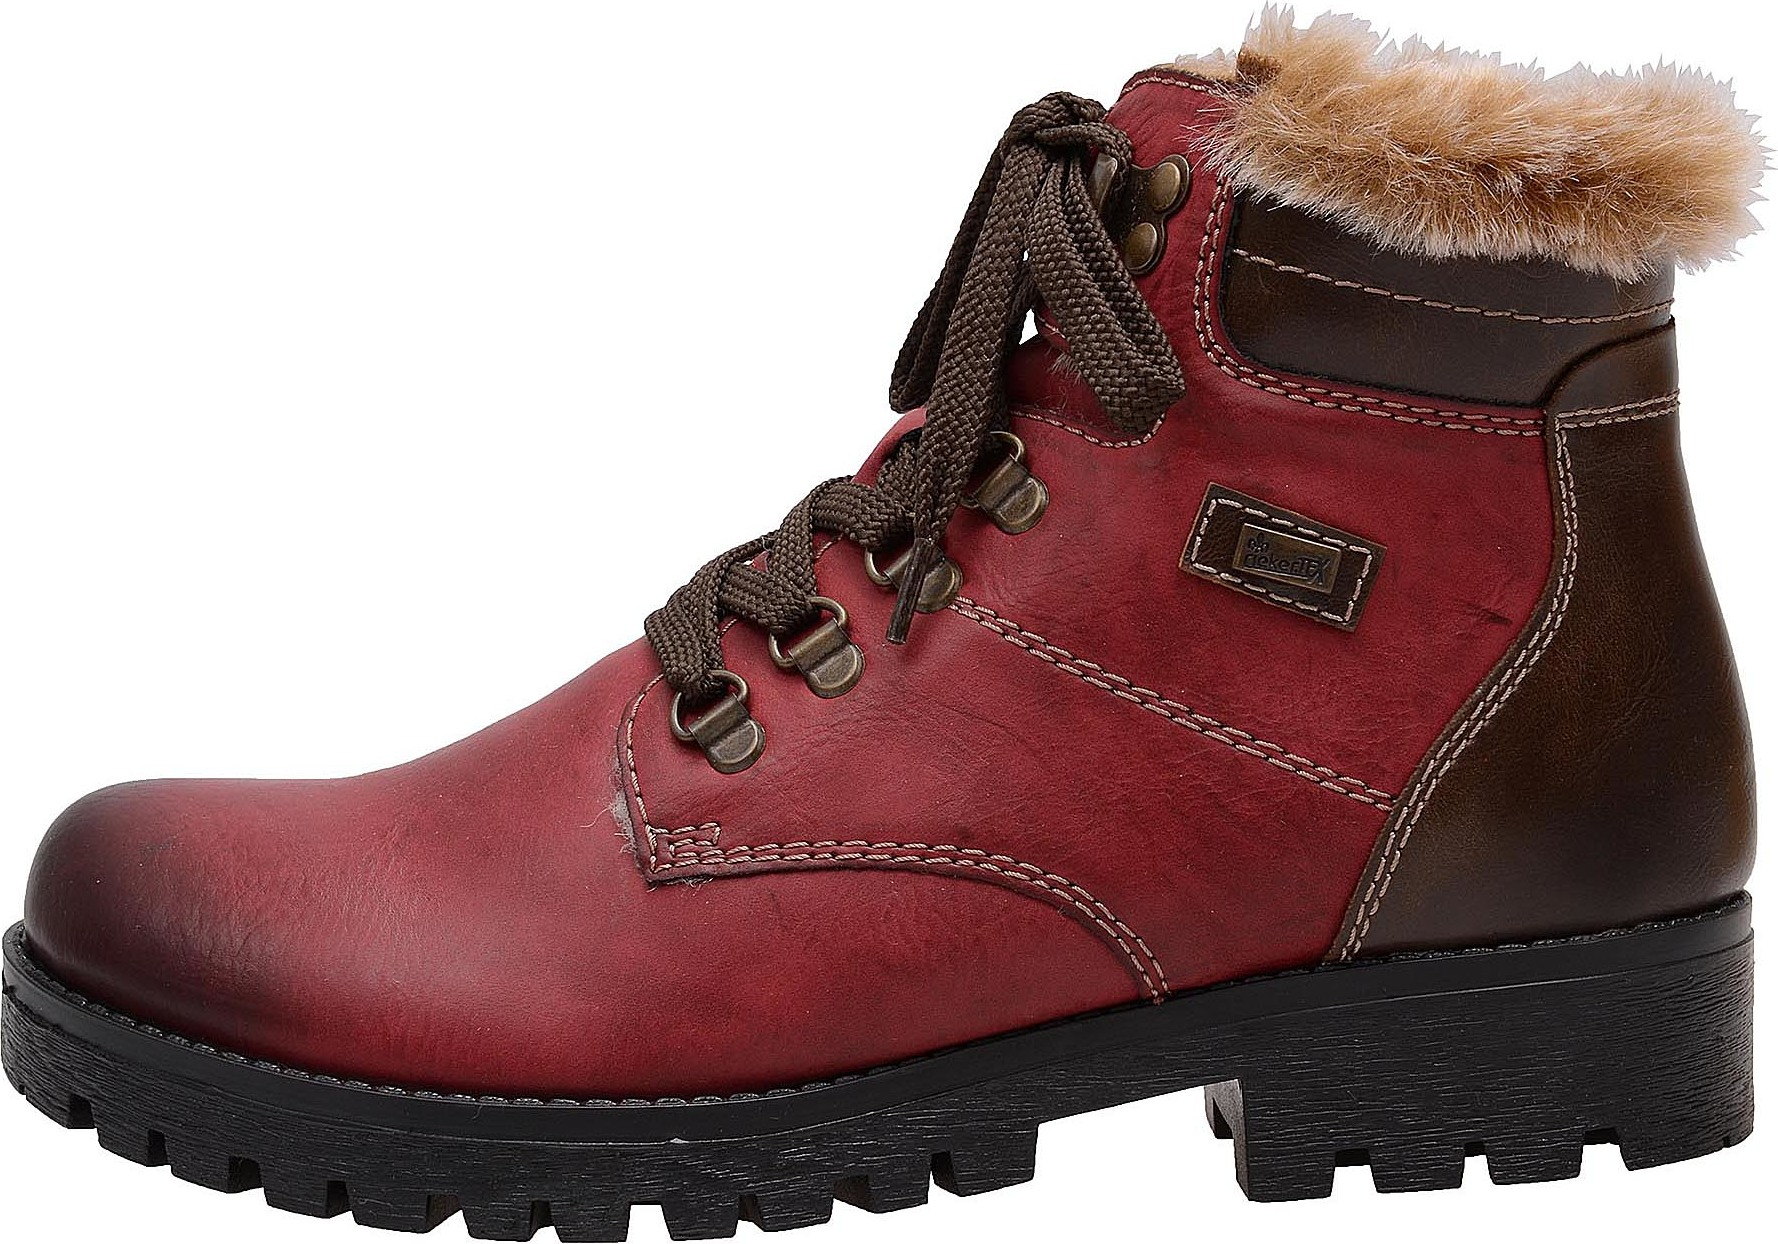 Dámská obuv RIEKER 785D1 35 ROT KOMBI H W 7 – Rieker Antistress c24ebd47ee